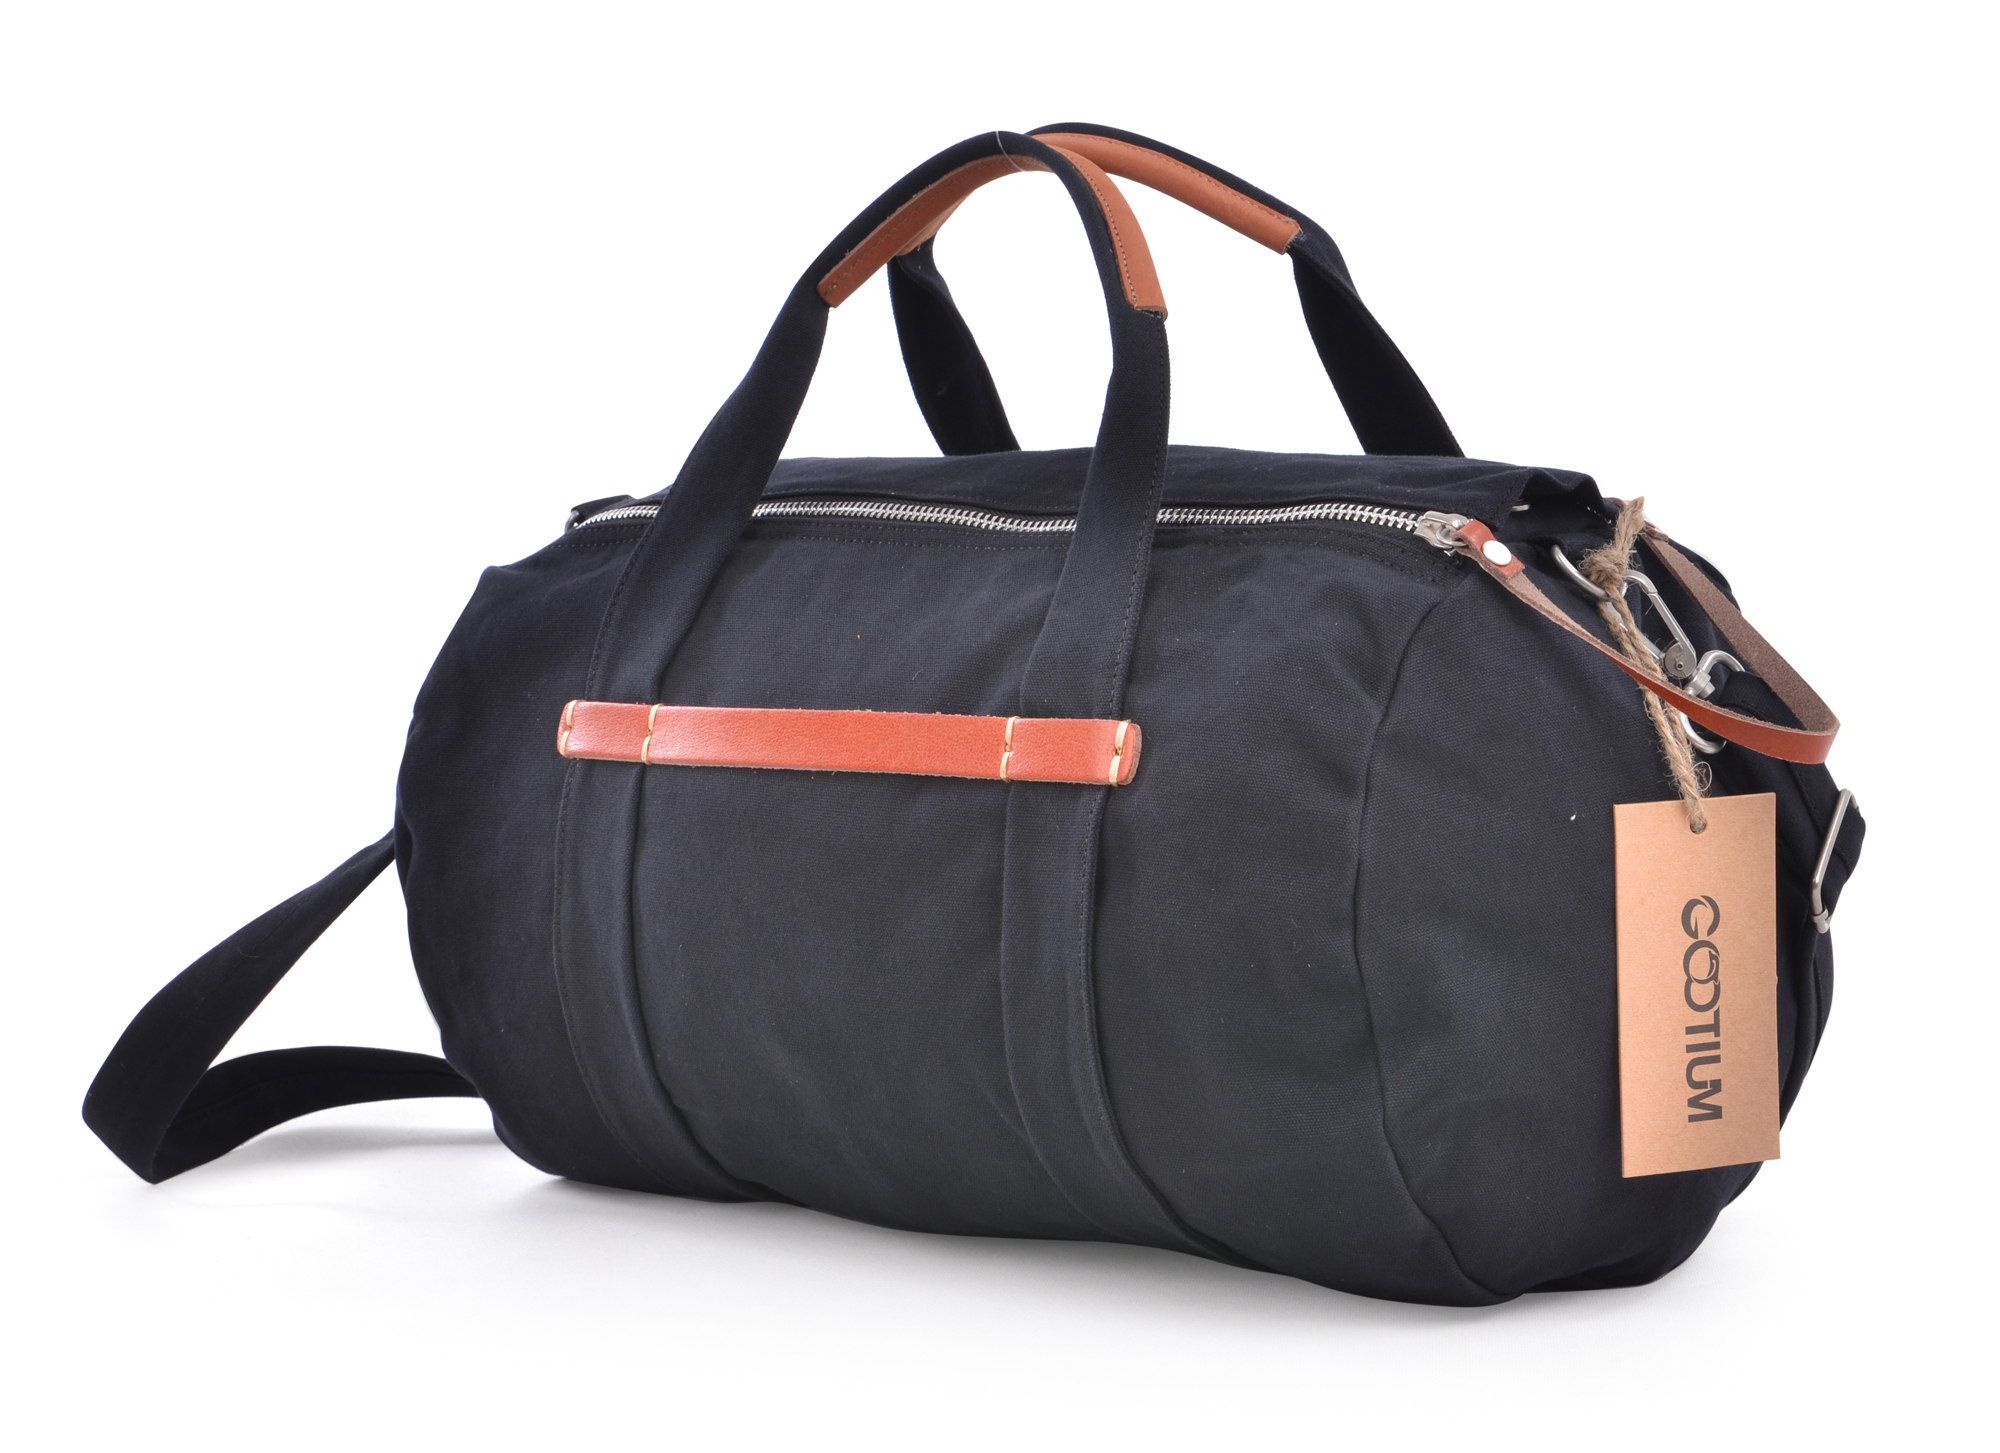 Gootium Canvas Leather Weekend Cross Body Duffle Bag Sports Gym ...